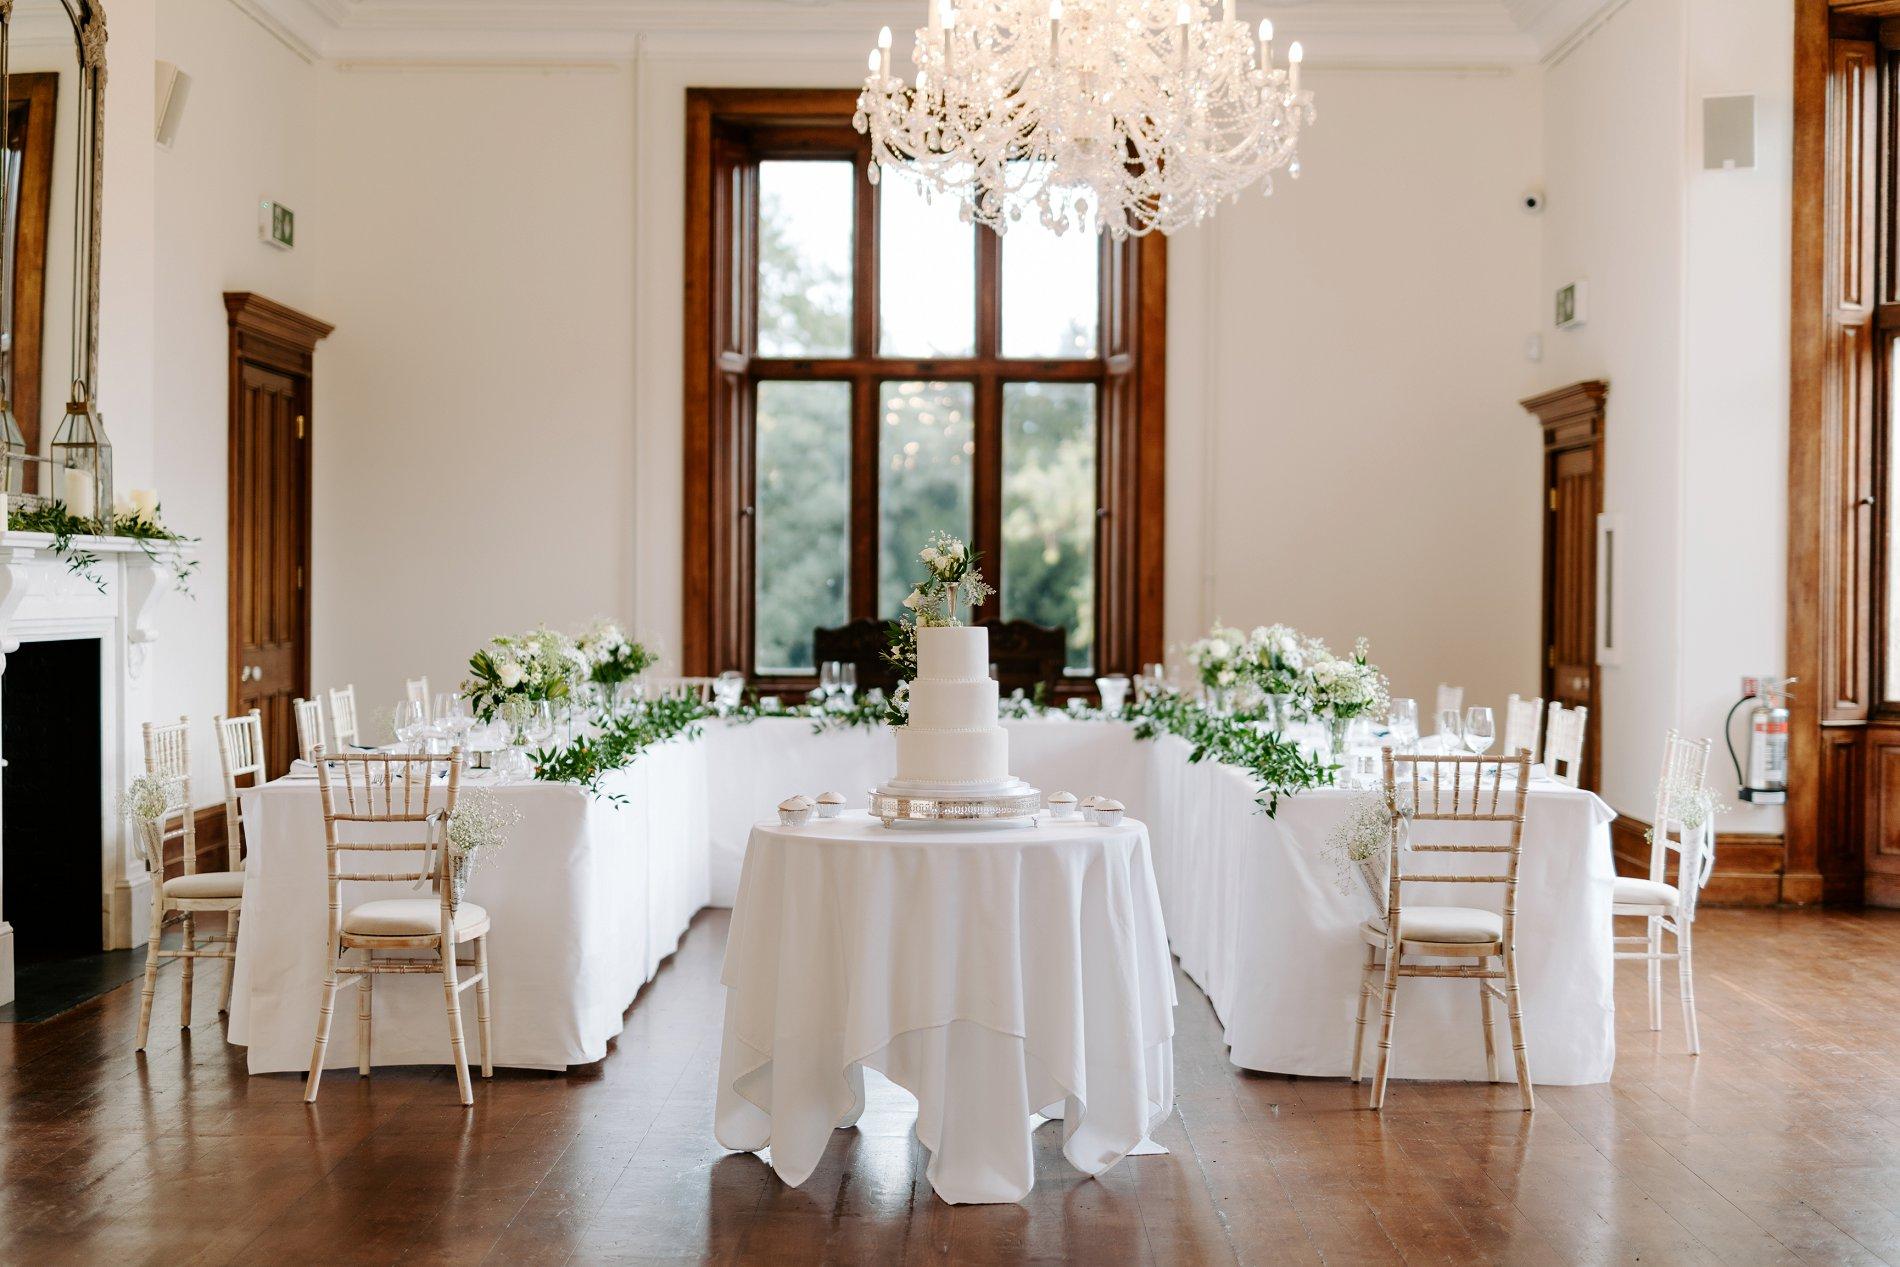 An Elegant White Wedding at Thicket Priory (c) Carla Whittingham Photography (45)